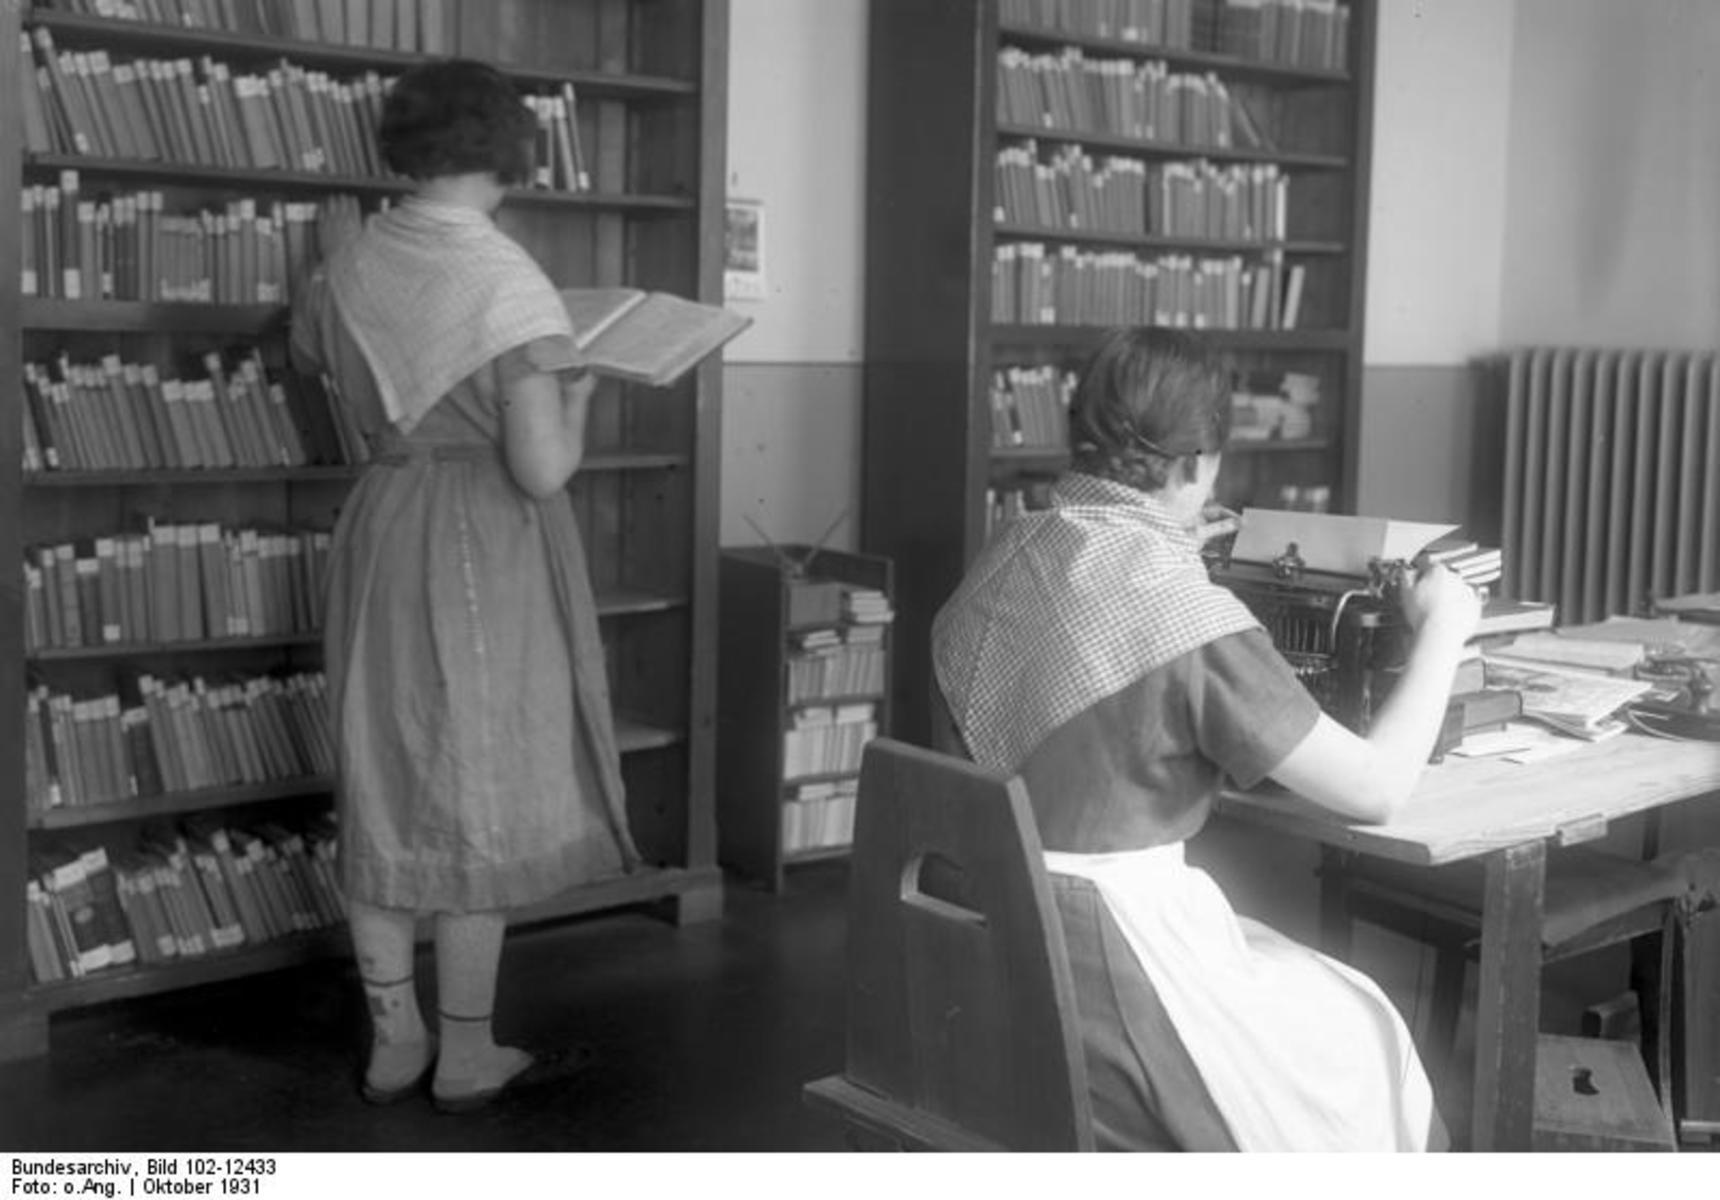 Bundesarchiv_Bild_102-12433,_Berlin,_Frauengefängnis,_Bibliothek.jpg